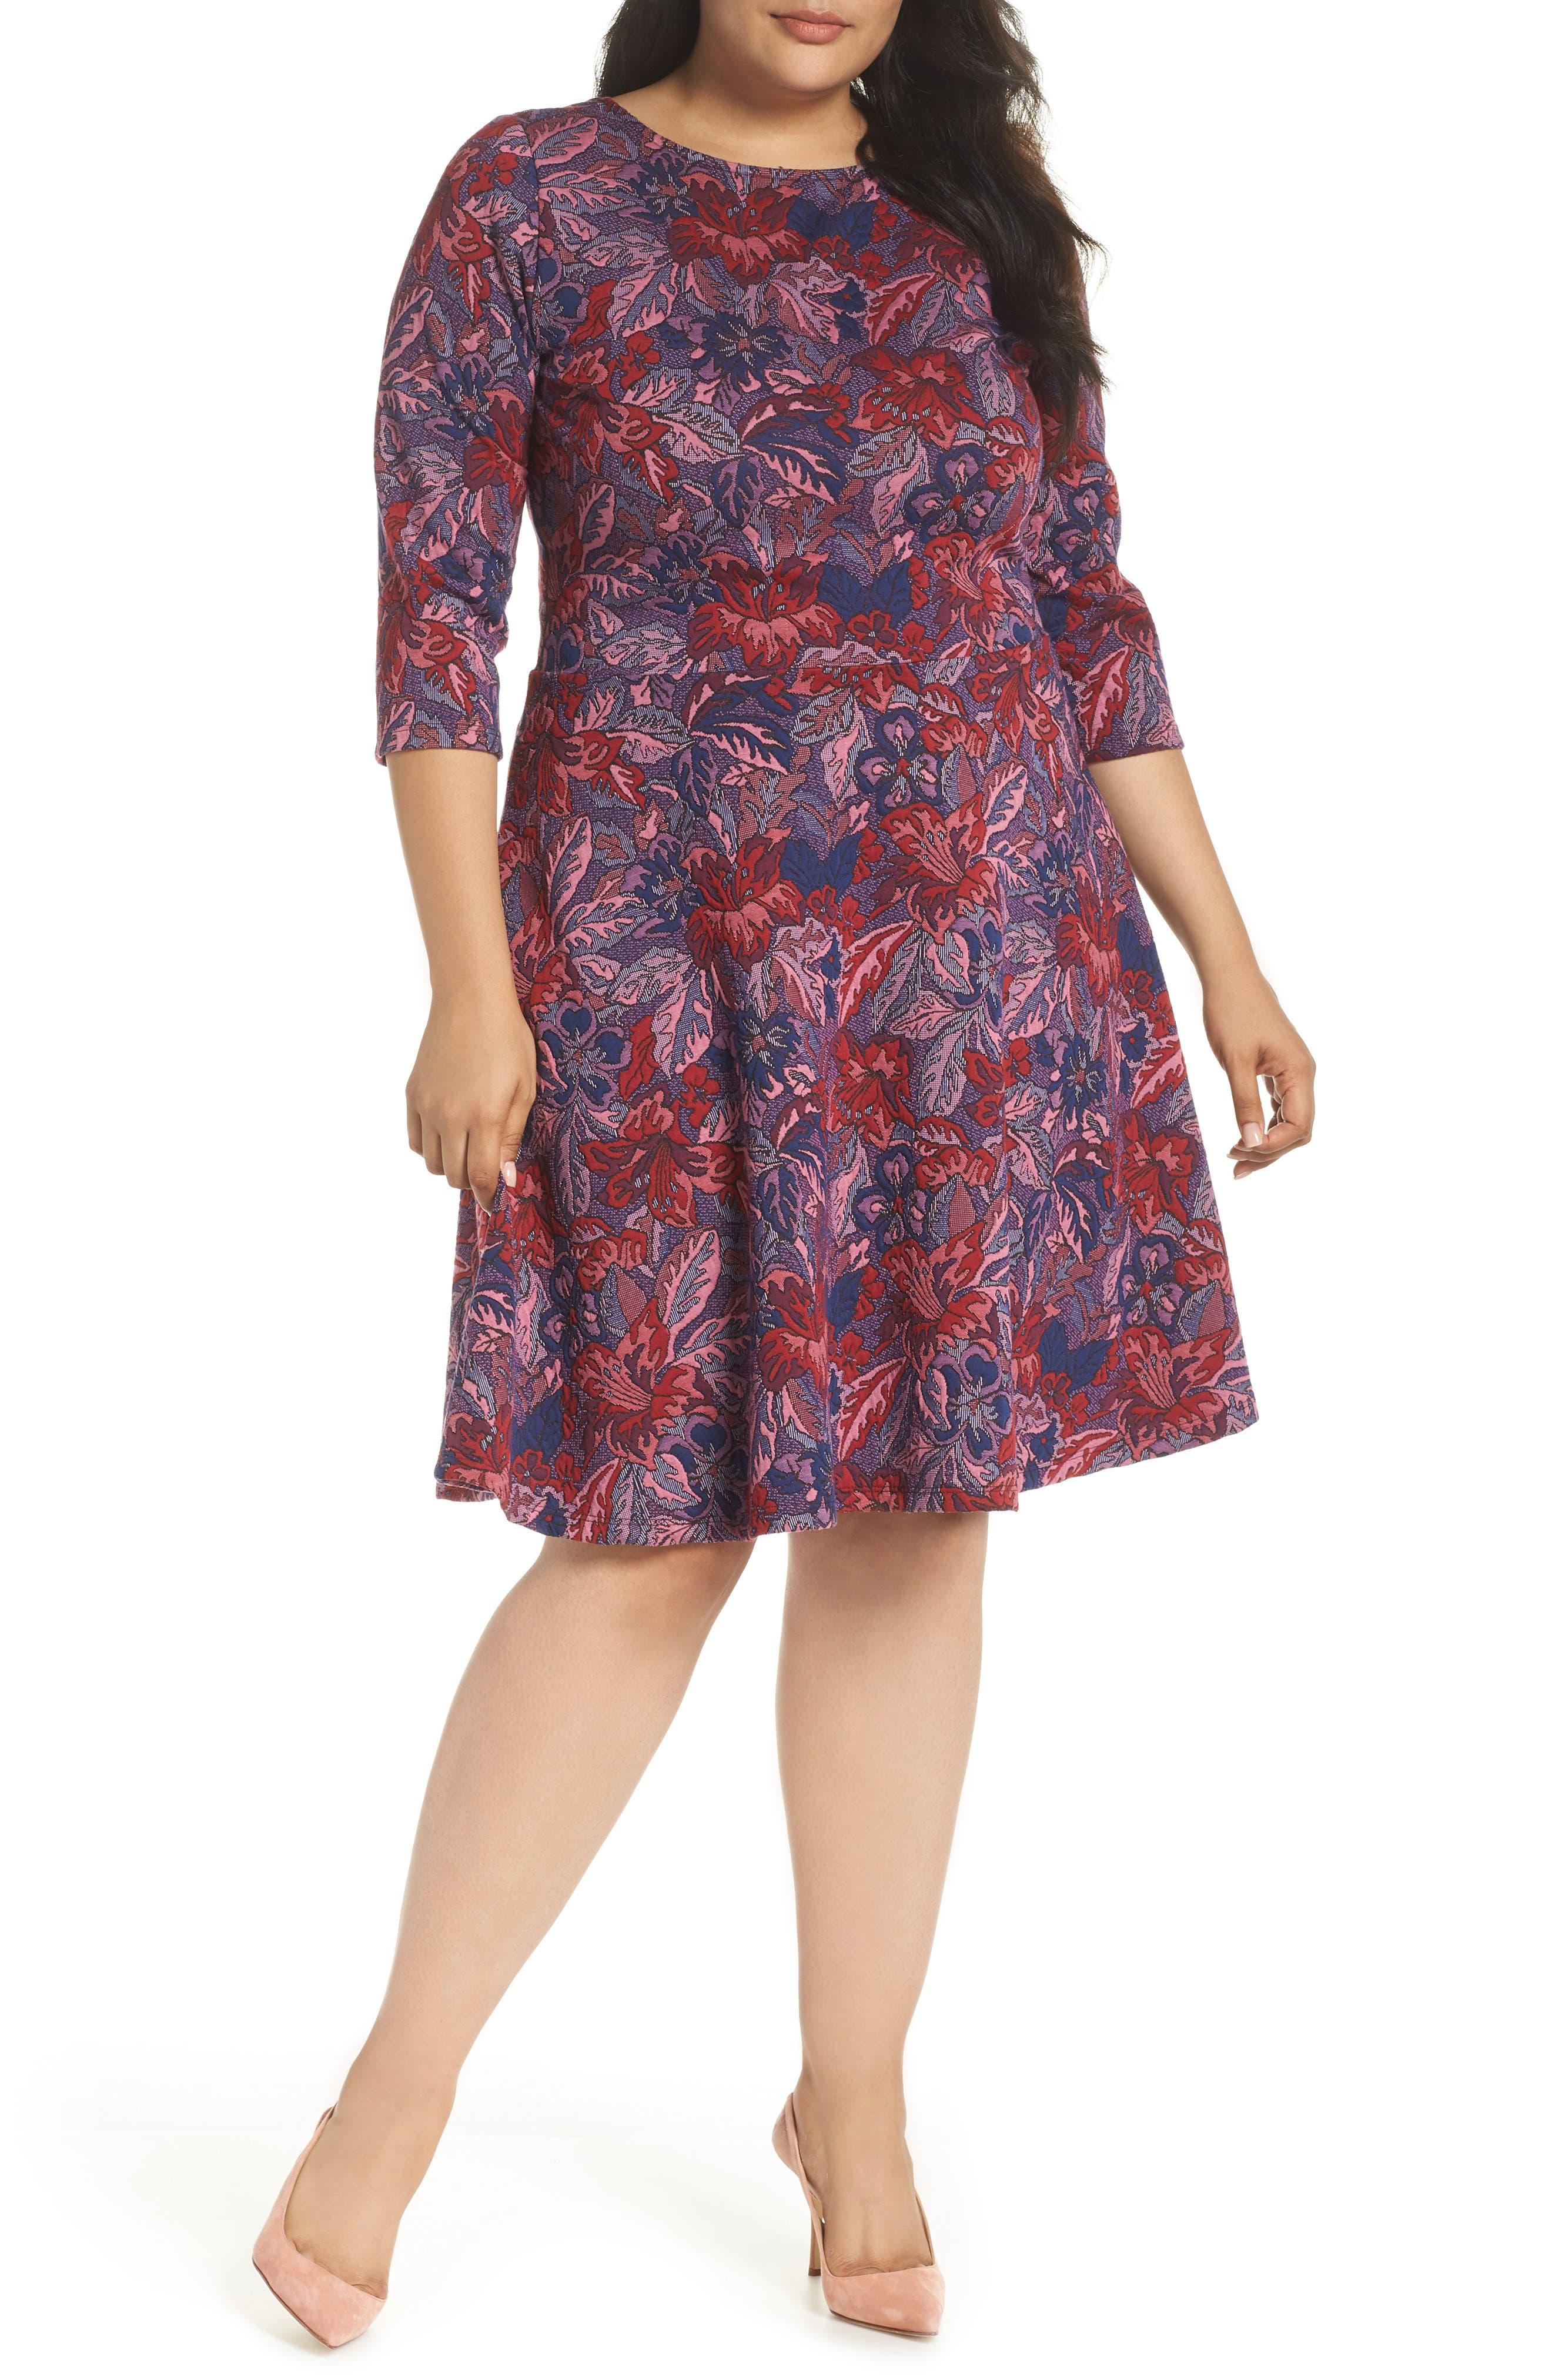 LEOTA Llana Stretch Jersey Dress in Tapestry Jacquard